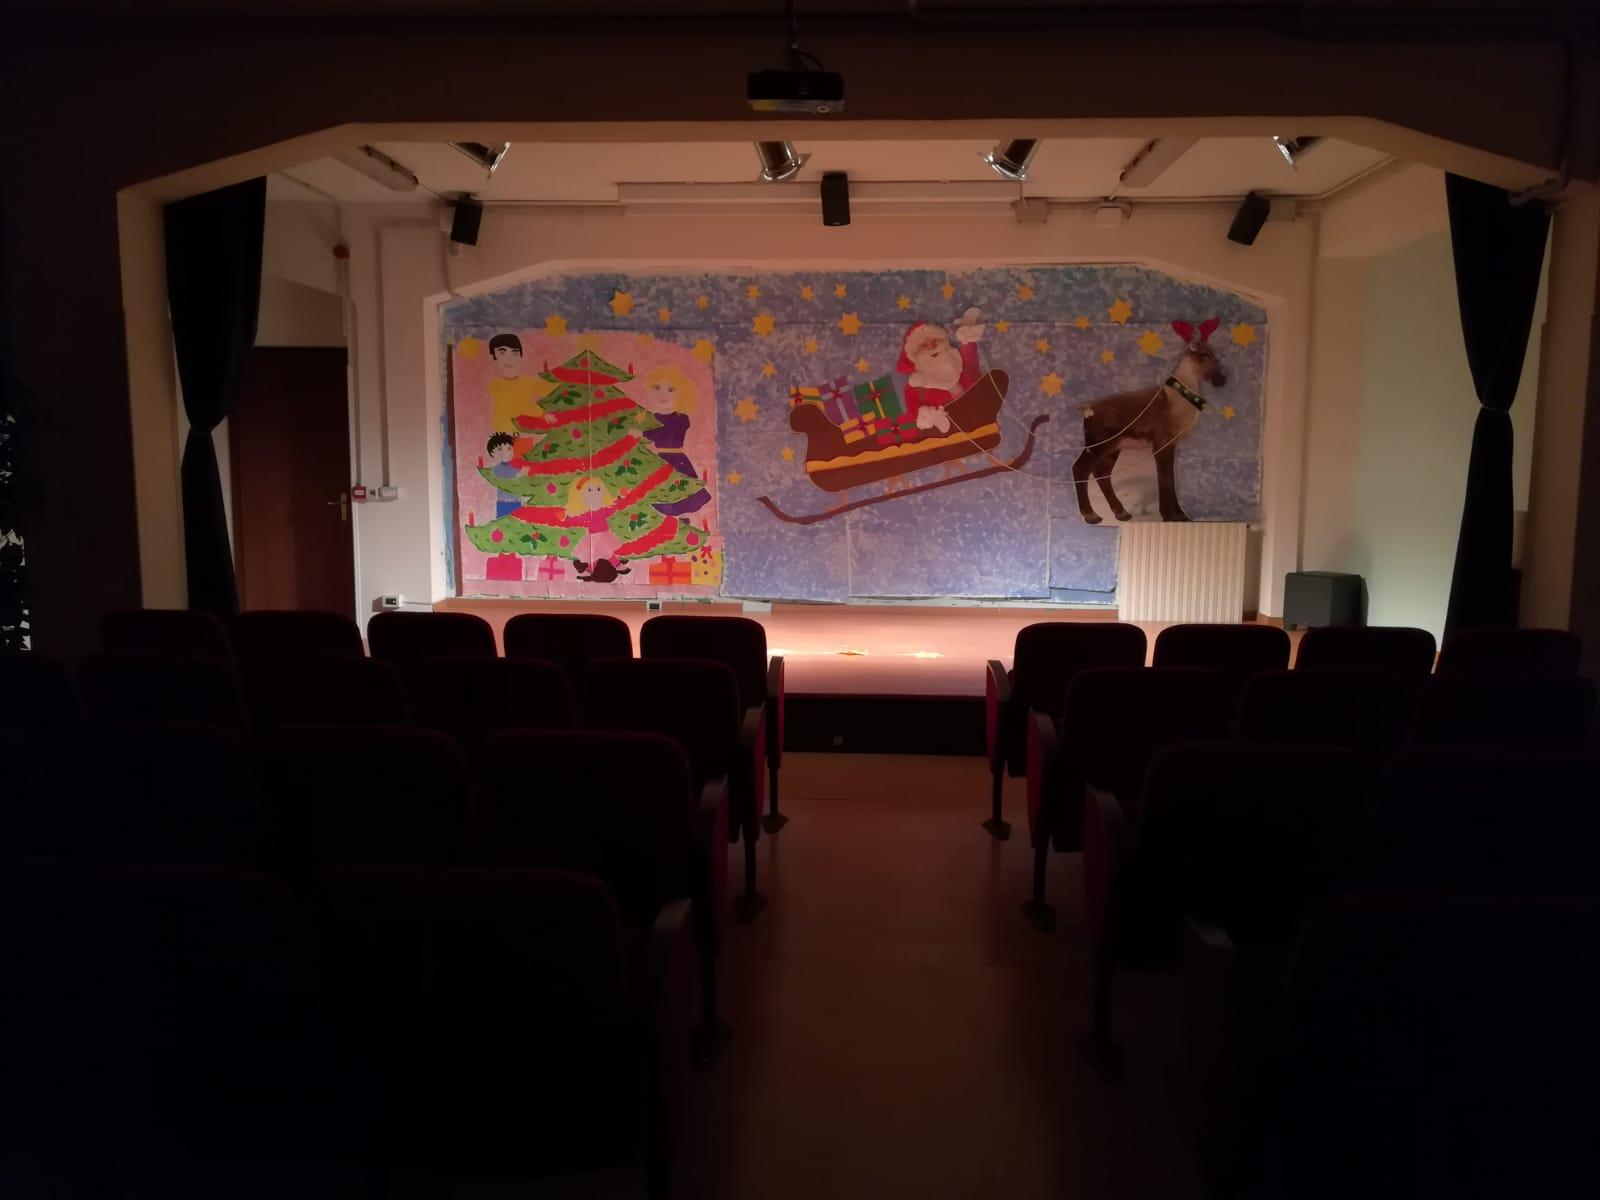 Foto casetta Fantasia, foto raffigurante il cineforum